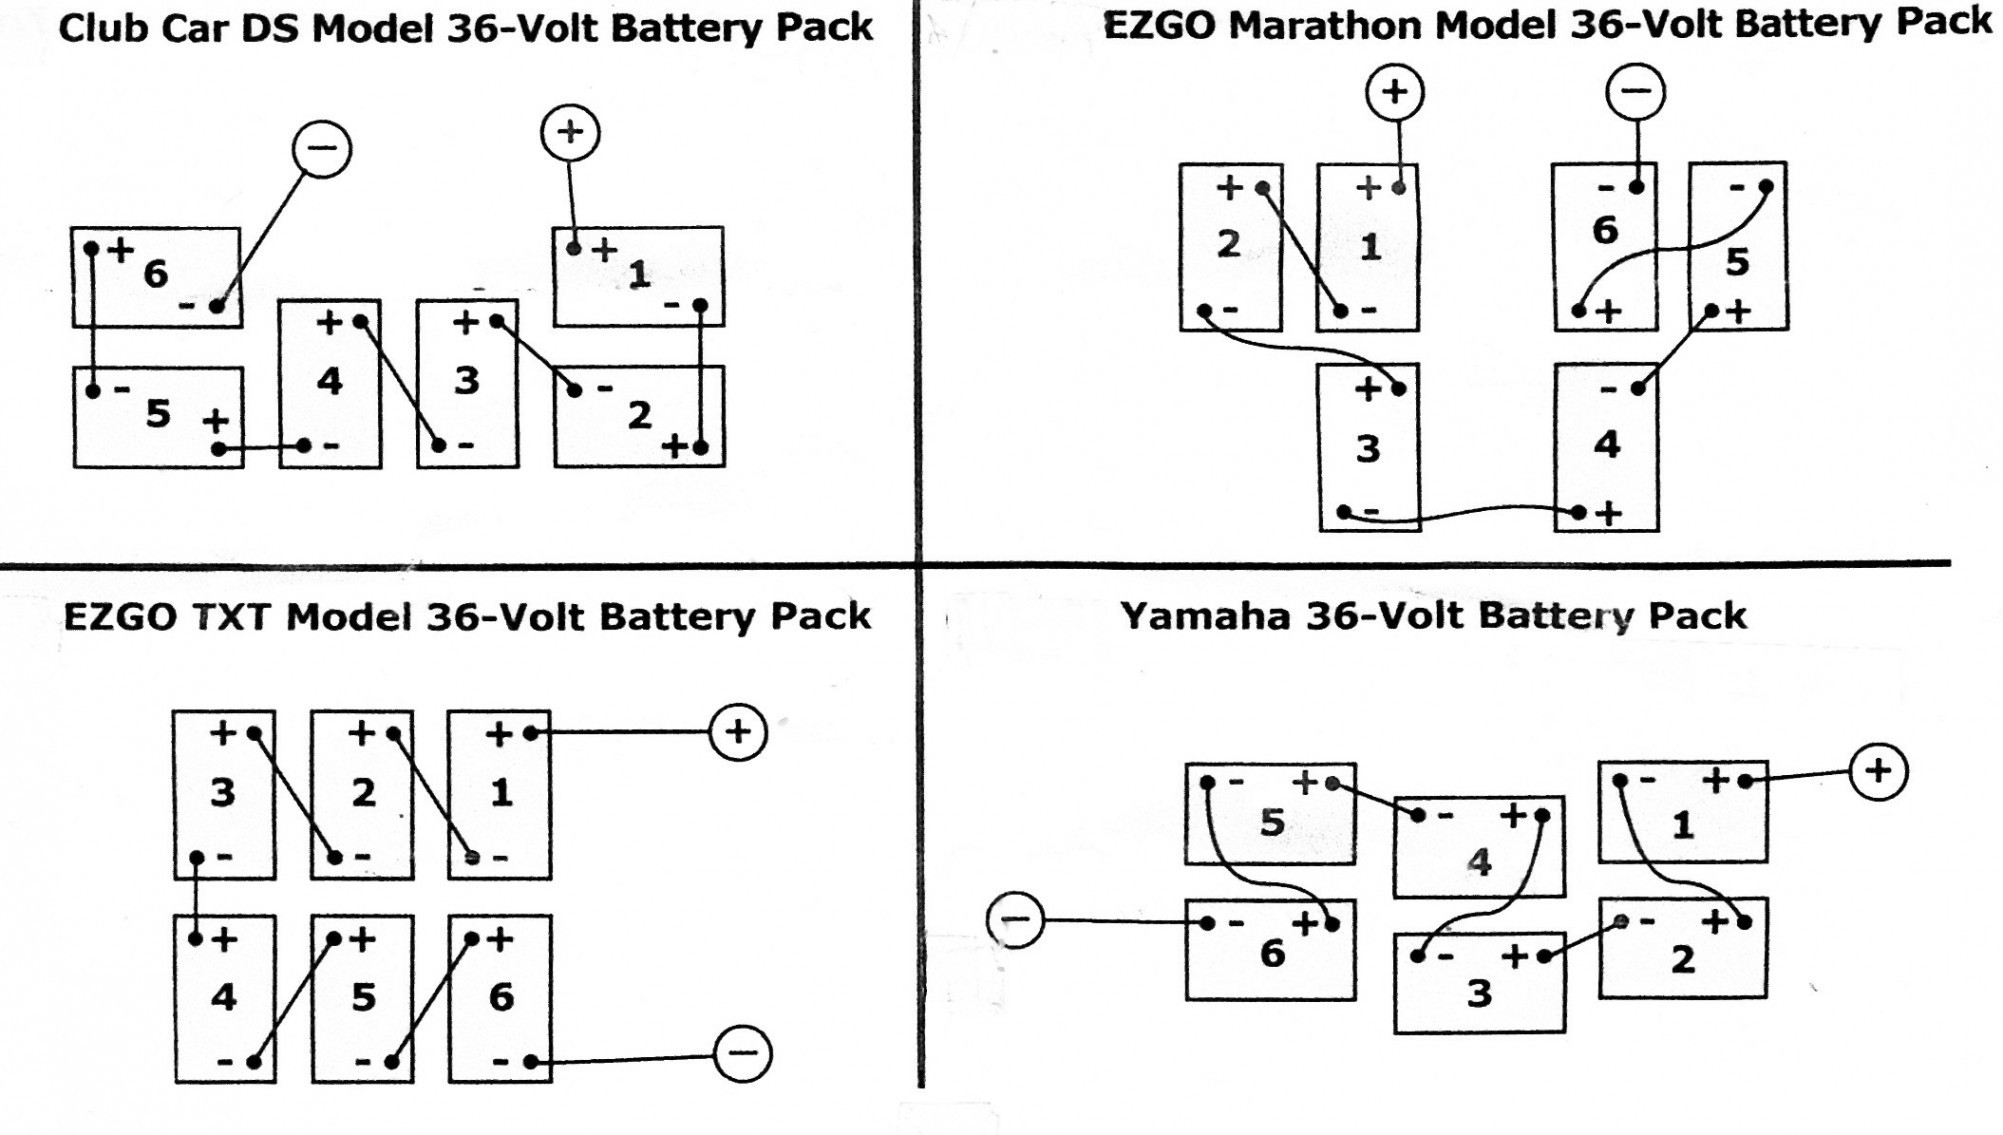 36 Volt Melex Wiring Diagram | Manual E-Books - Ezgo 36 Volt Wiring Diagram